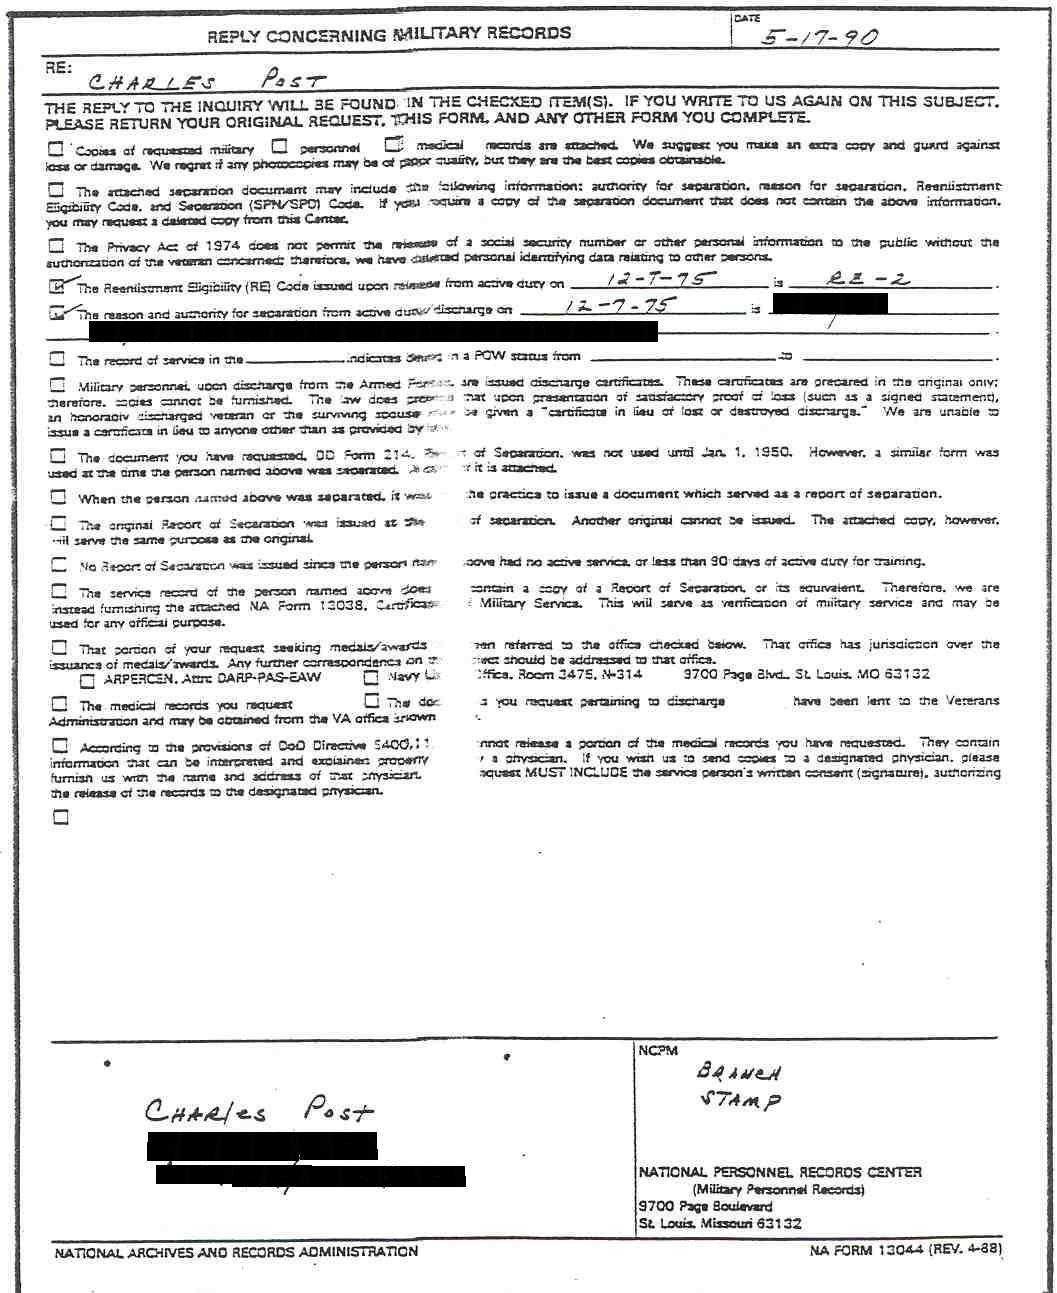 Blank Dd214 form Download Pin form Dd 214 Download Dd214 Worksheet Blank Http Renyuw